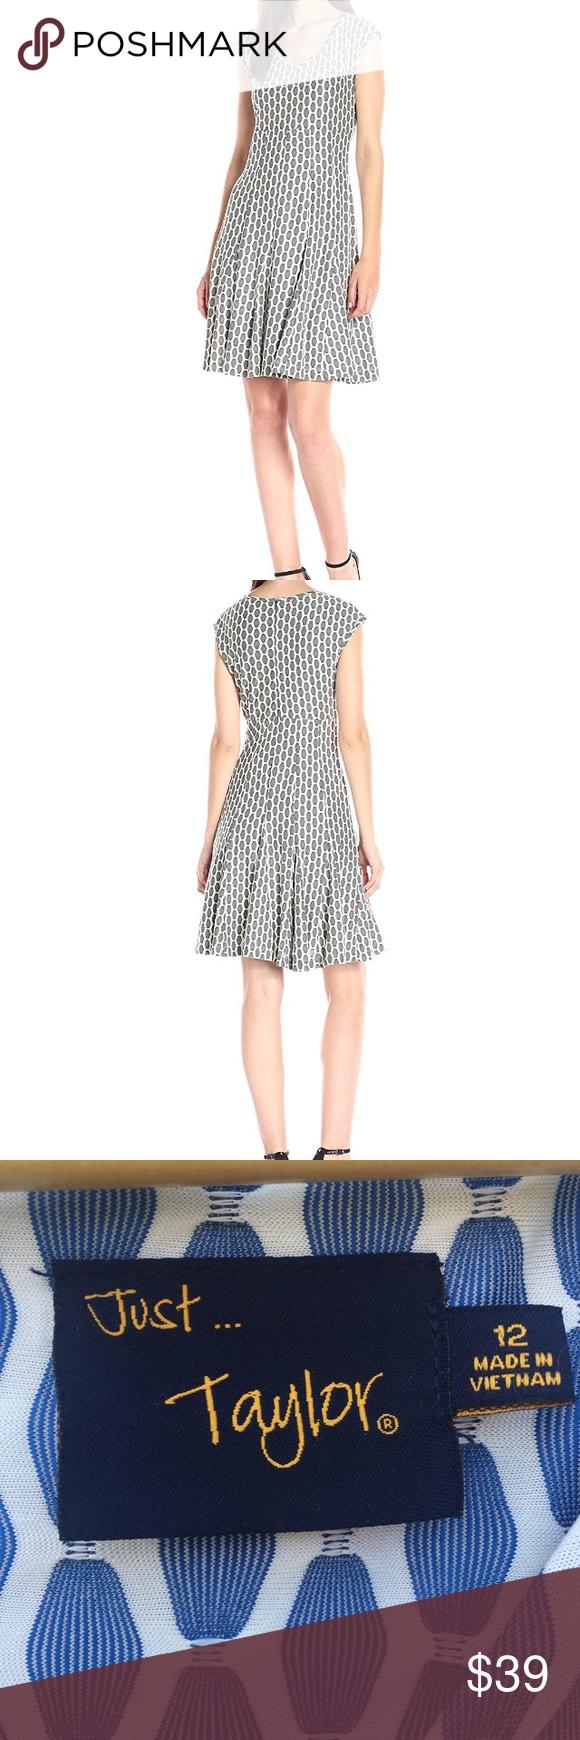 Just Taylor Midi Blue White Summer Dress Size 12 White Dress Summer Clothes Design Taylor Dress [ 1740 x 580 Pixel ]